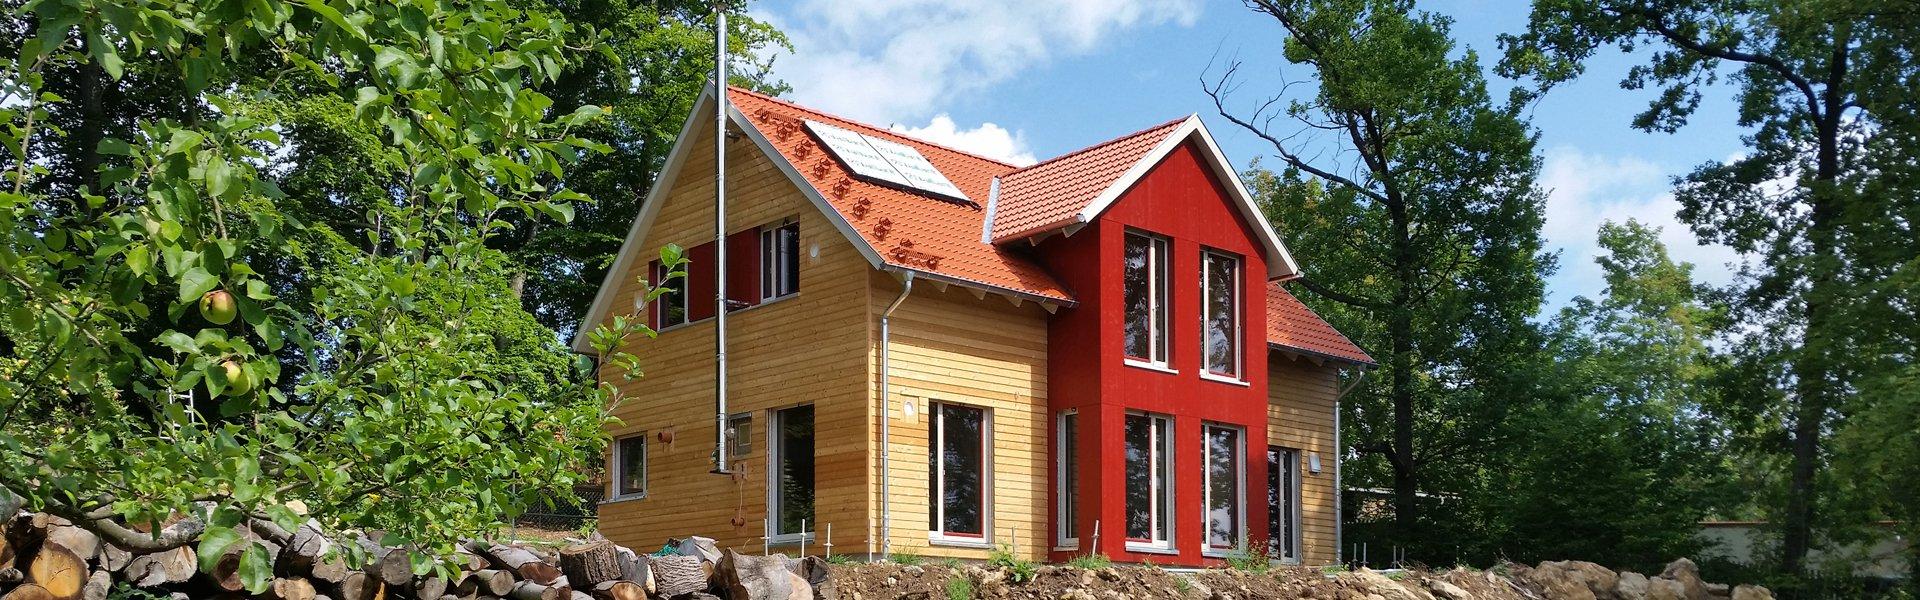 Holzhaus in Pößneck